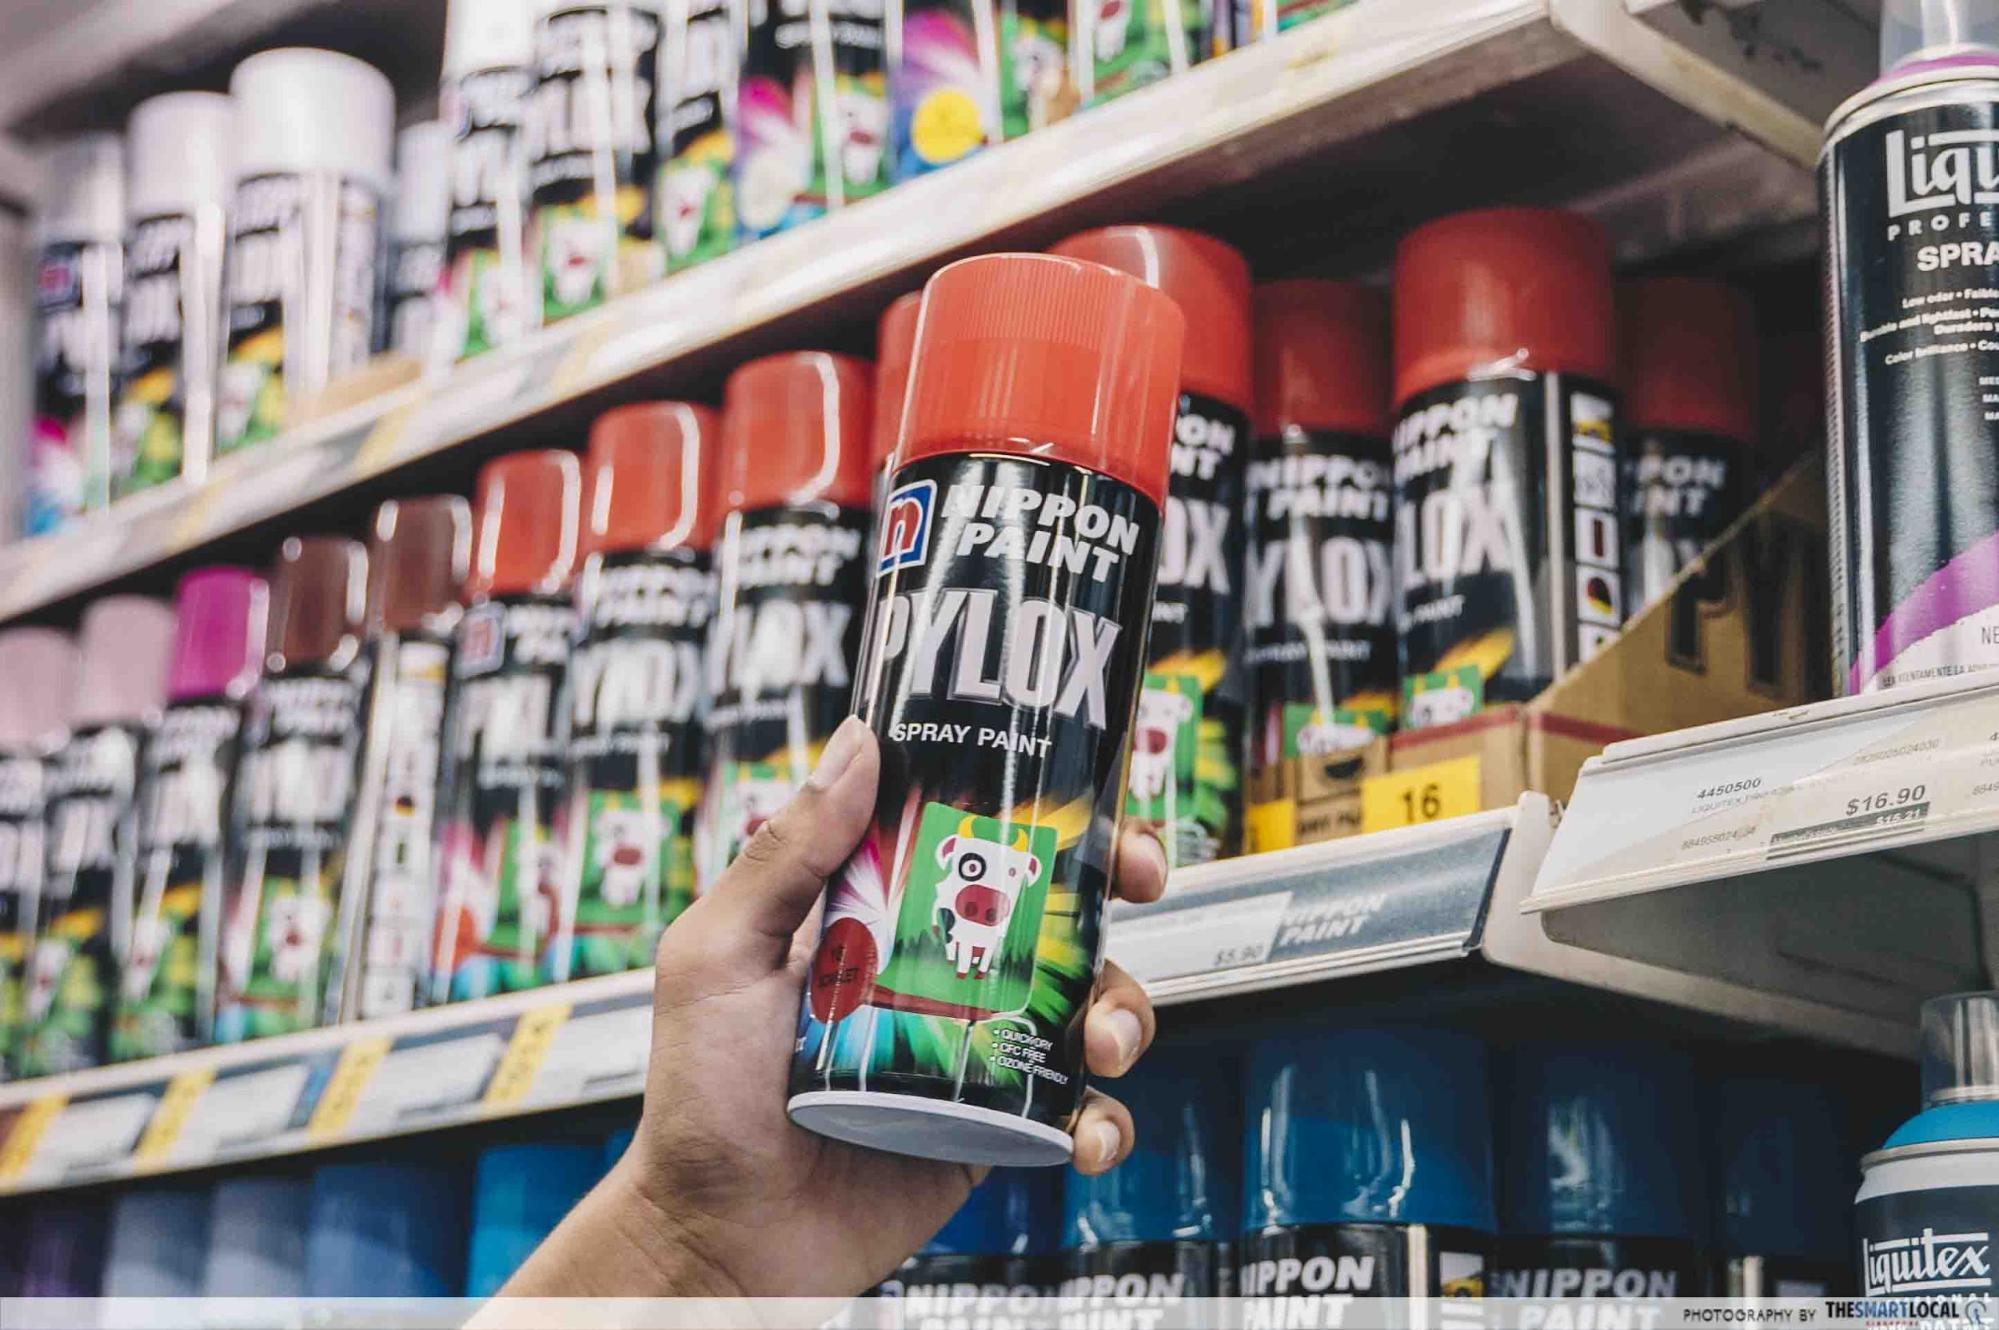 nippon pylox spray paint